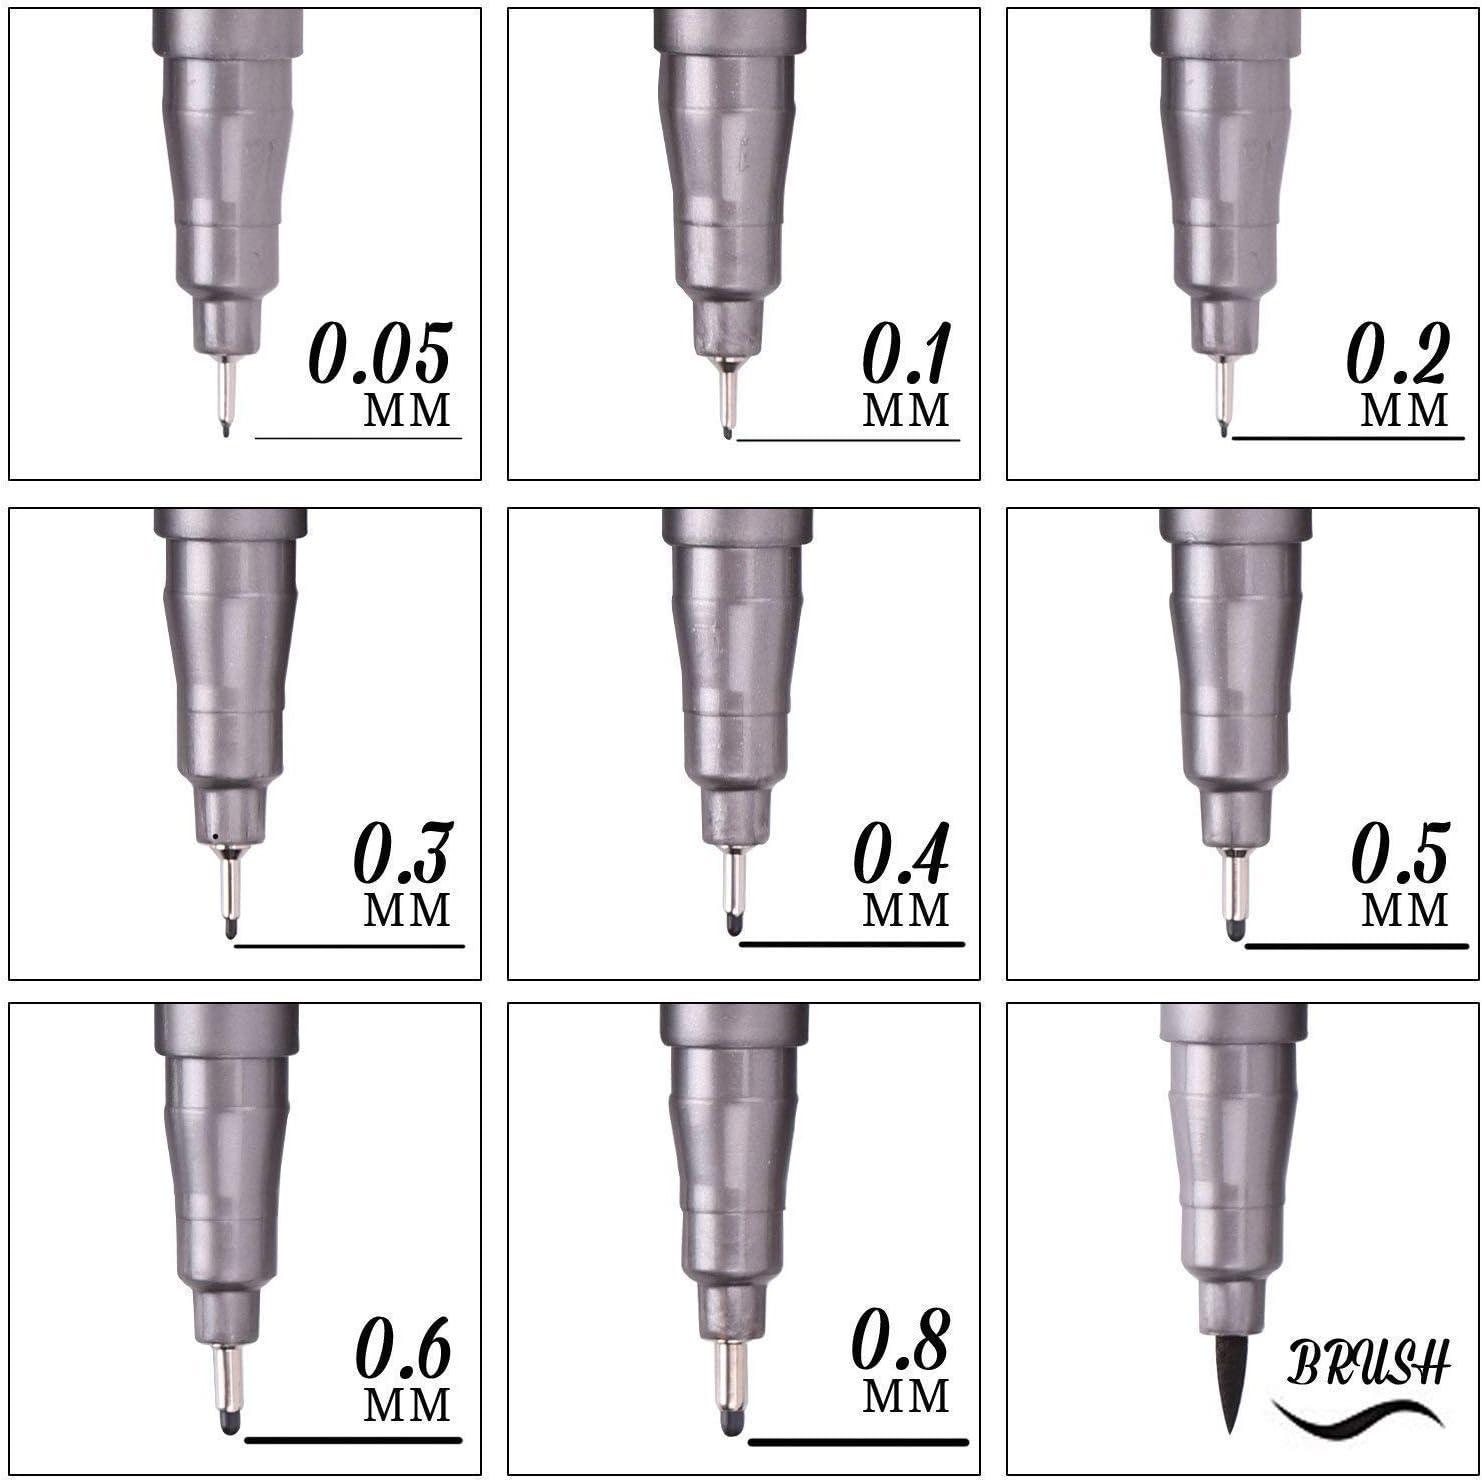 Plumas de L/ínea Fina 0,05 mm- 0,8mm Fineliner Drawing Pens para Ilustraci/ón Manga Dibujo Redacci/ón Office de Documentos Funnasting Negros Punta Fina